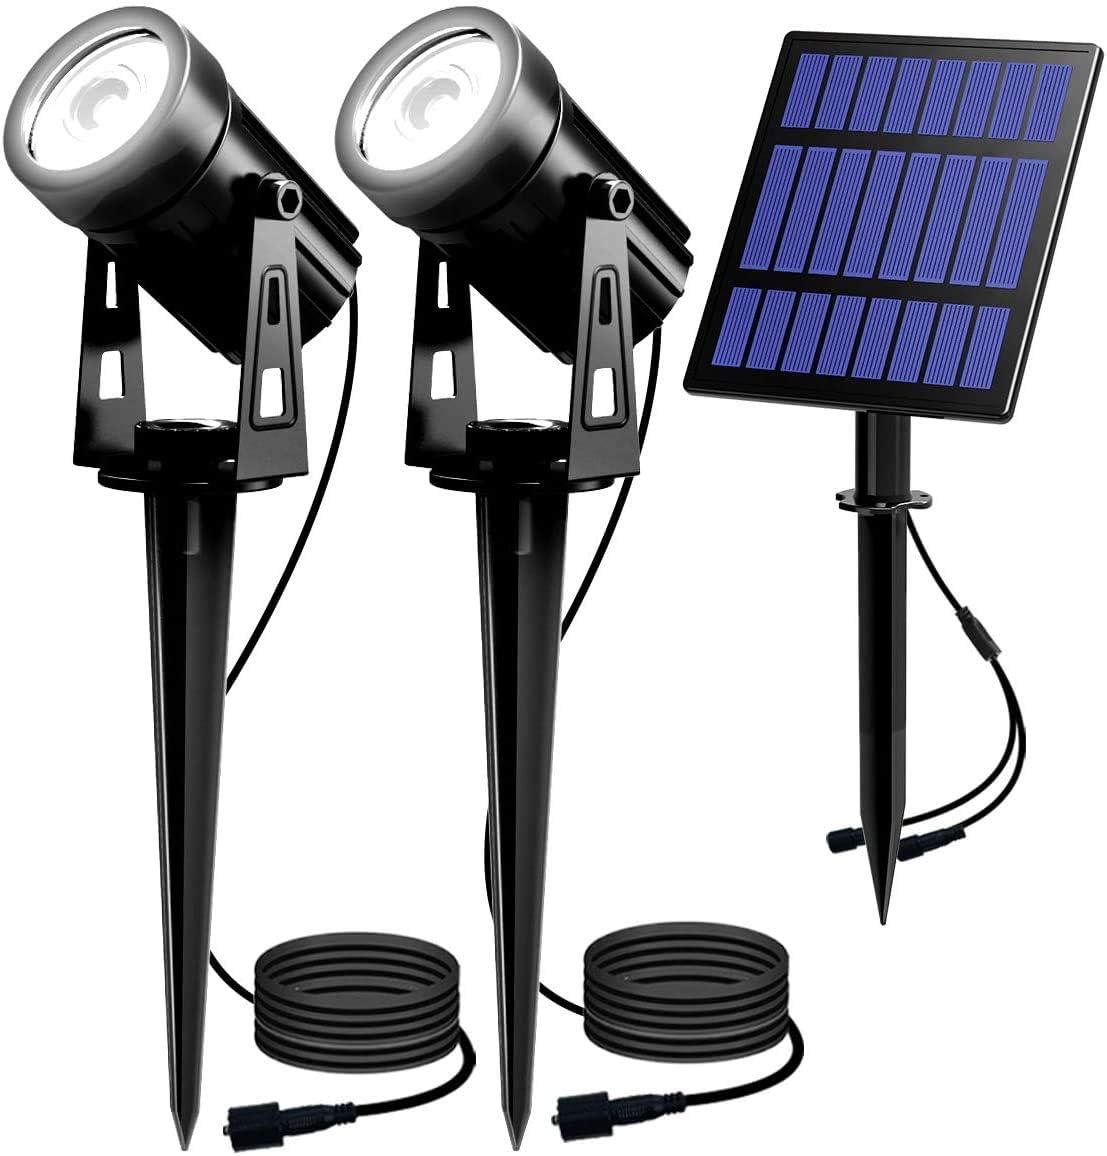 T-SUN 2W Solar Spotlights, LED Solar Powered Landscape Lights Outdoor Waterproof Solar Security Wall Lights Auto ON/Off Dual Head Light for Garden Yard Patio(Warm White)